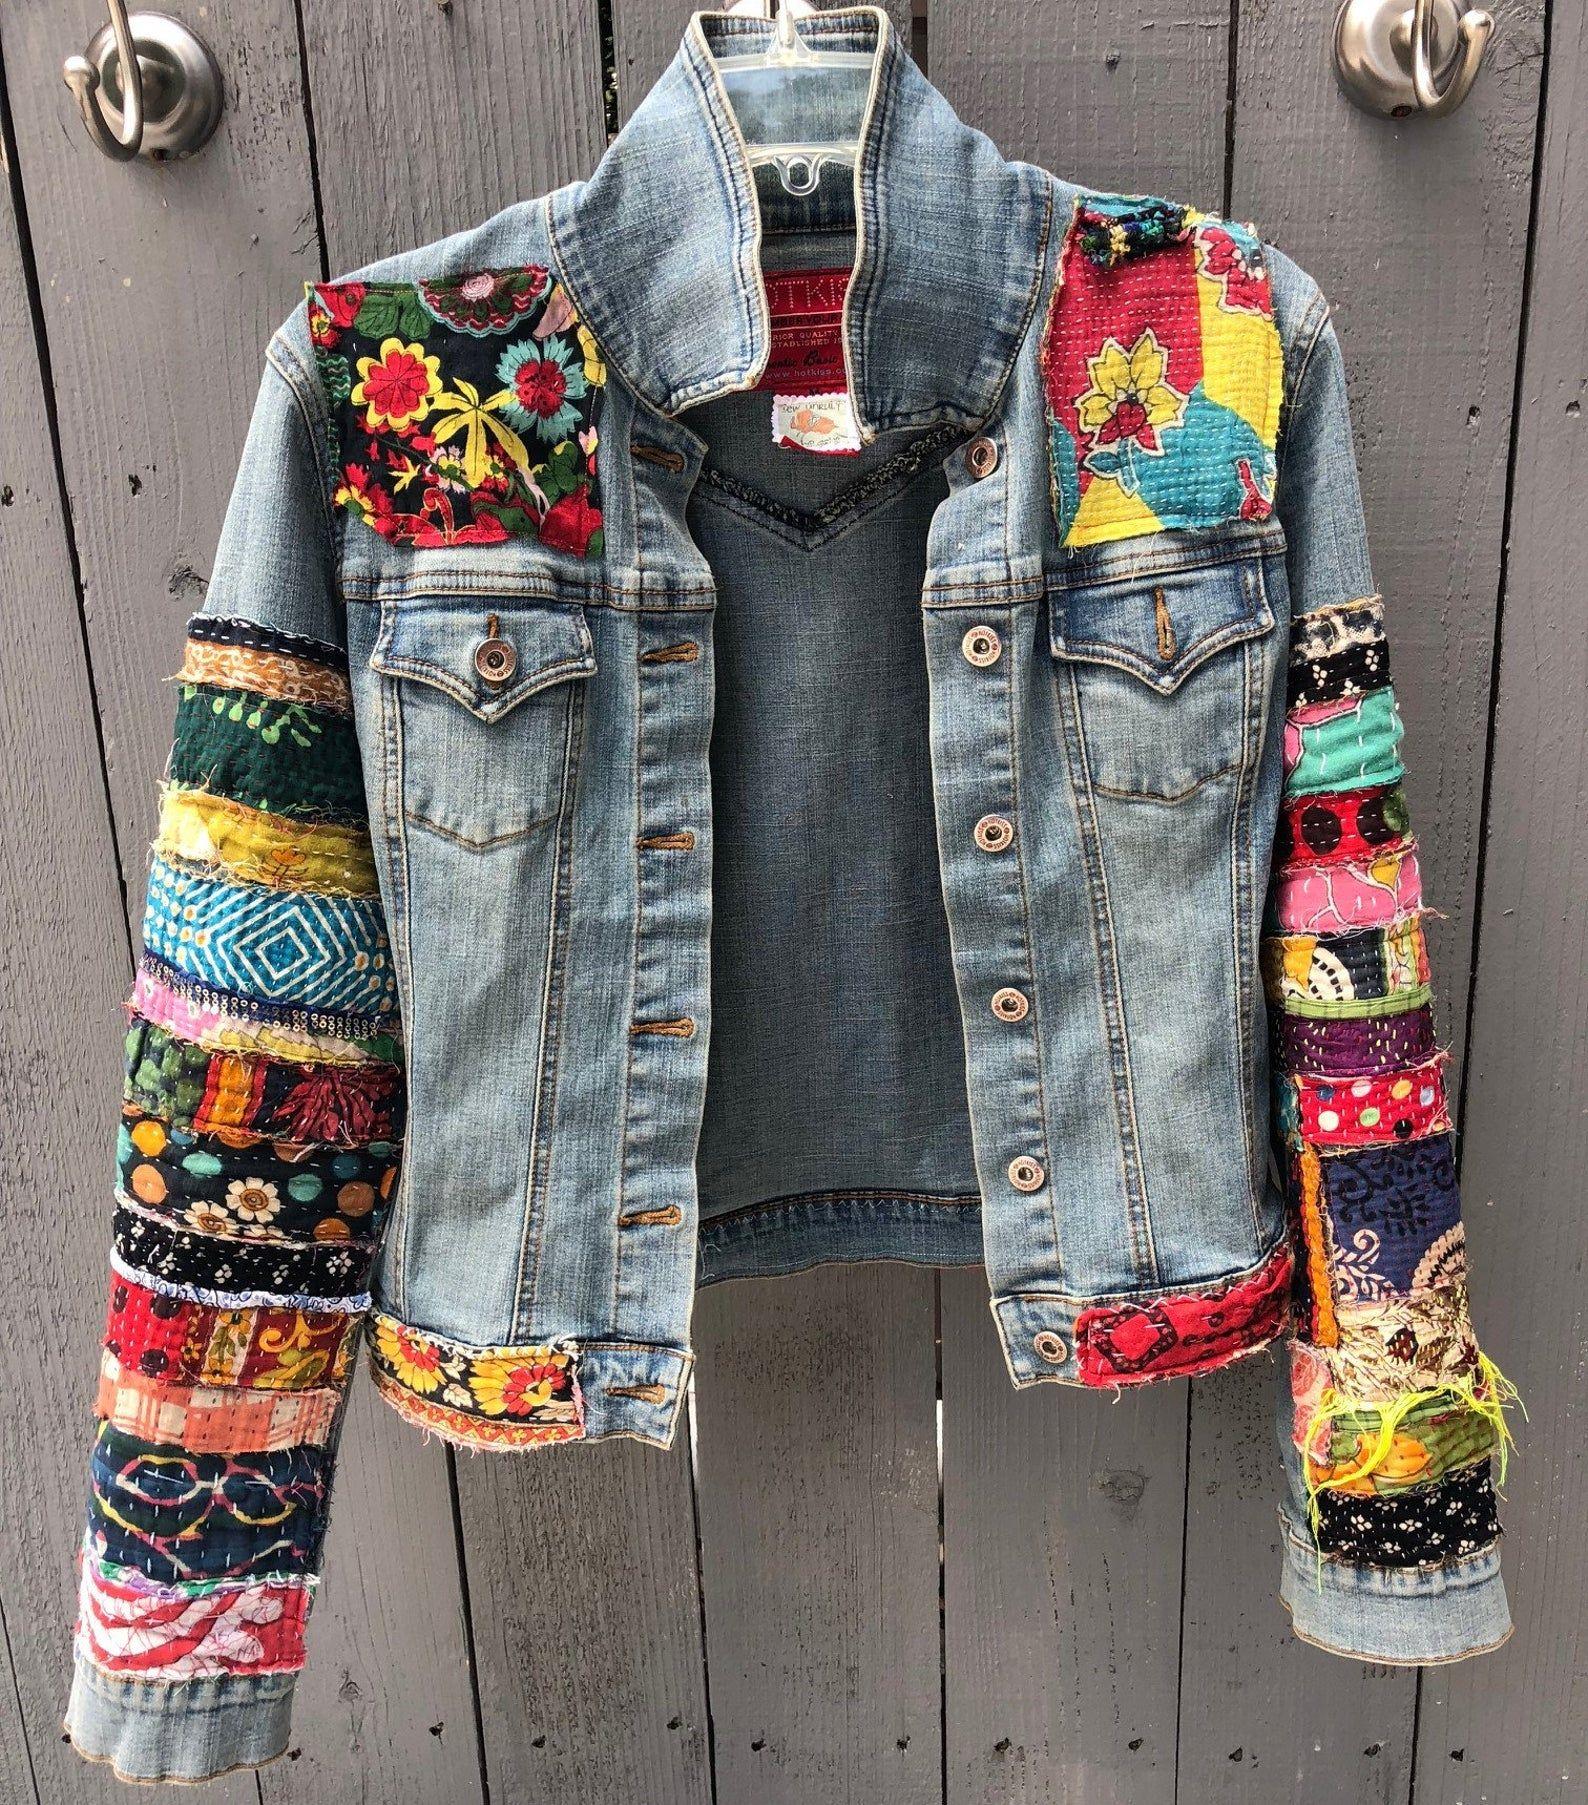 Jean Jacket Hippie Boho Embellished Colorful Denim Jean Jacket Etsy Embellished Denim Jacket Jean Jacket Outfits Denim Jean Jacket [ 1805 x 1588 Pixel ]